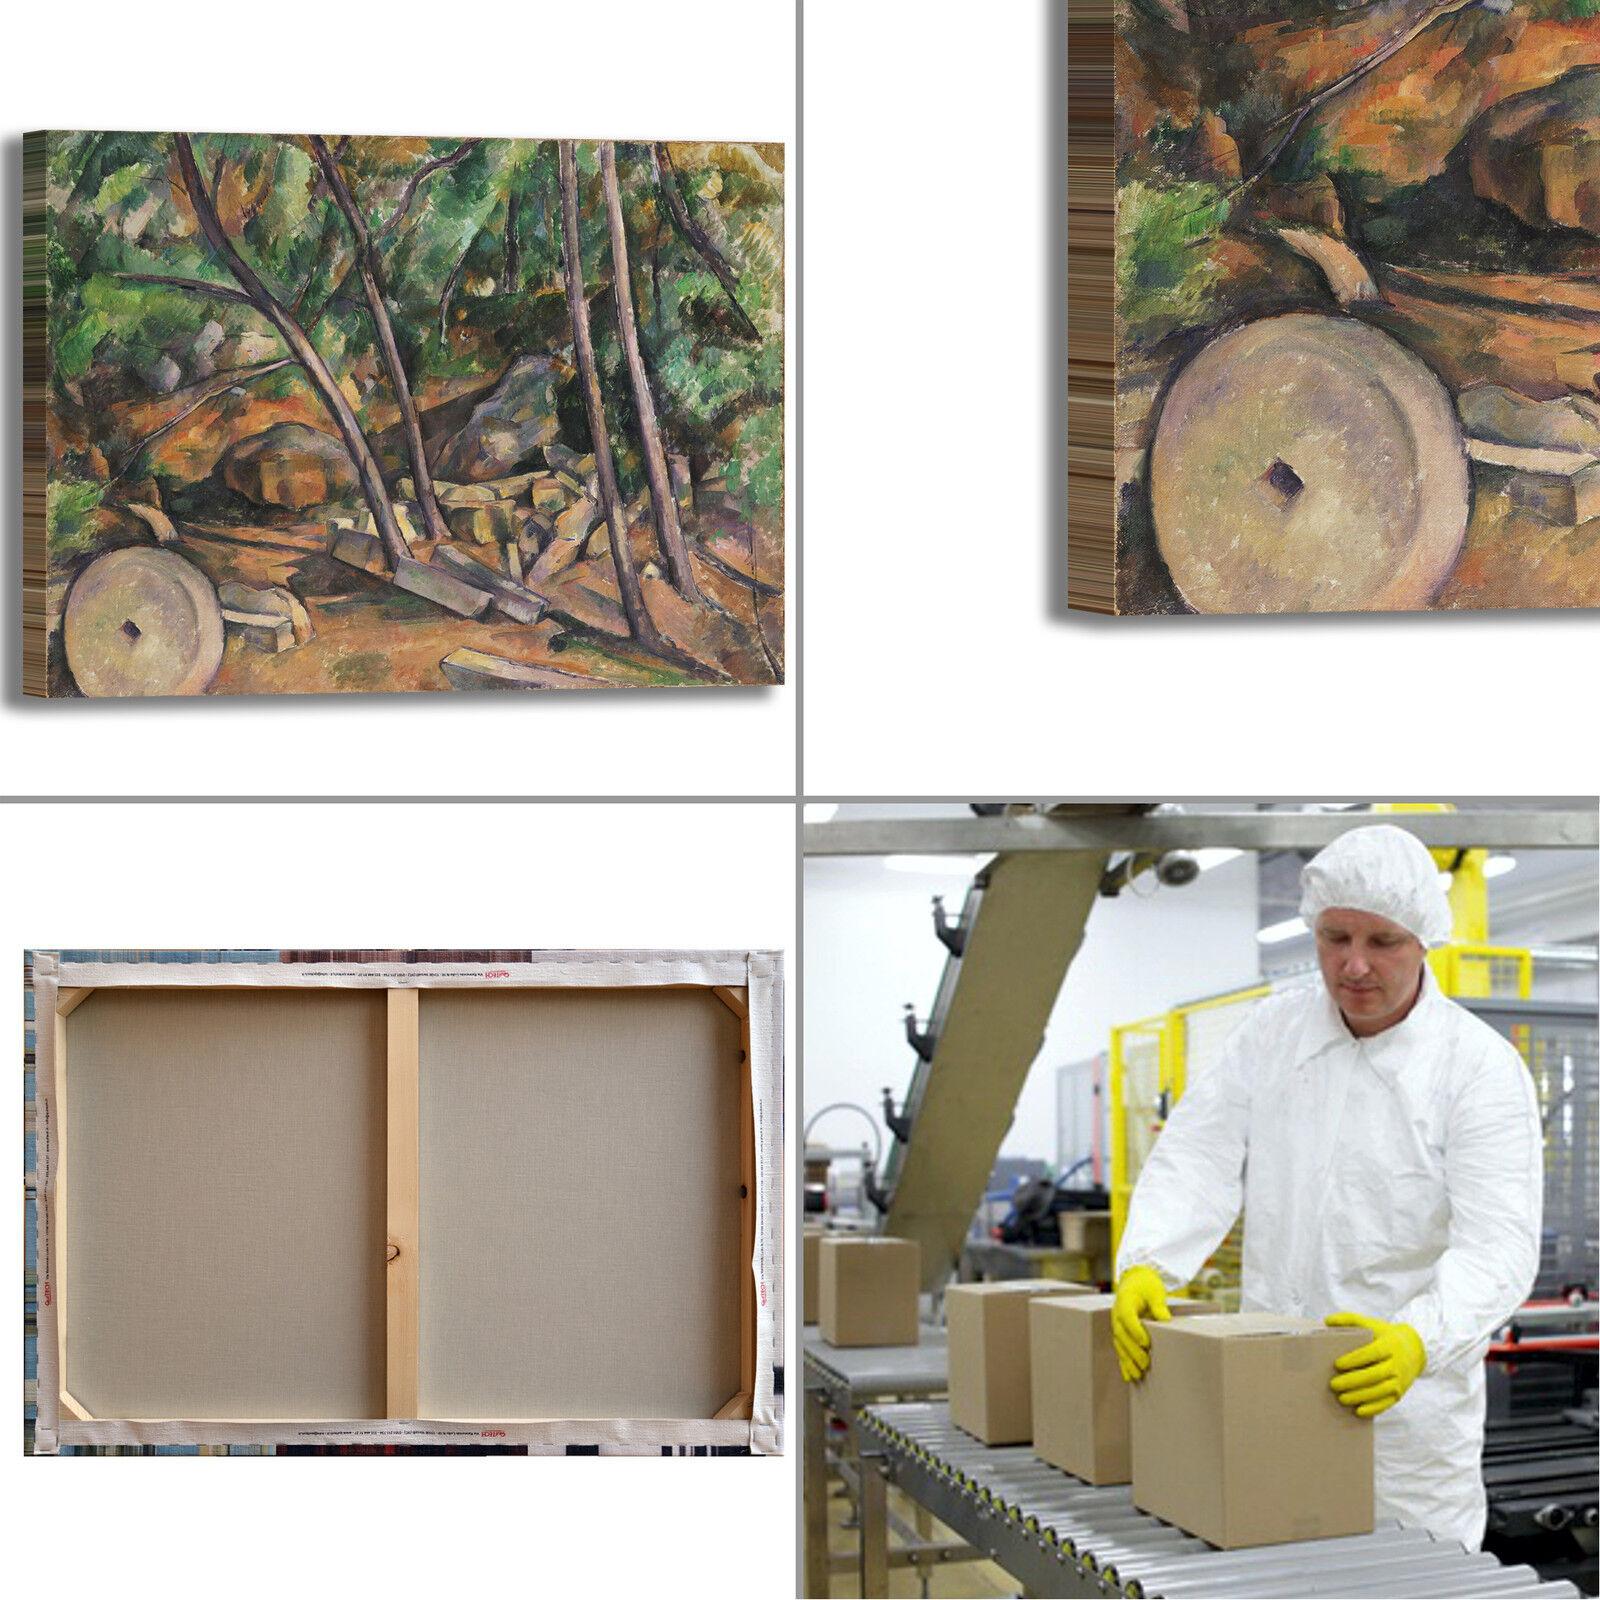 Cezanne macina nel parco design quadro stampa tela tela tela dipinto telaio arRouge o casa | Stocker  6e0c3a